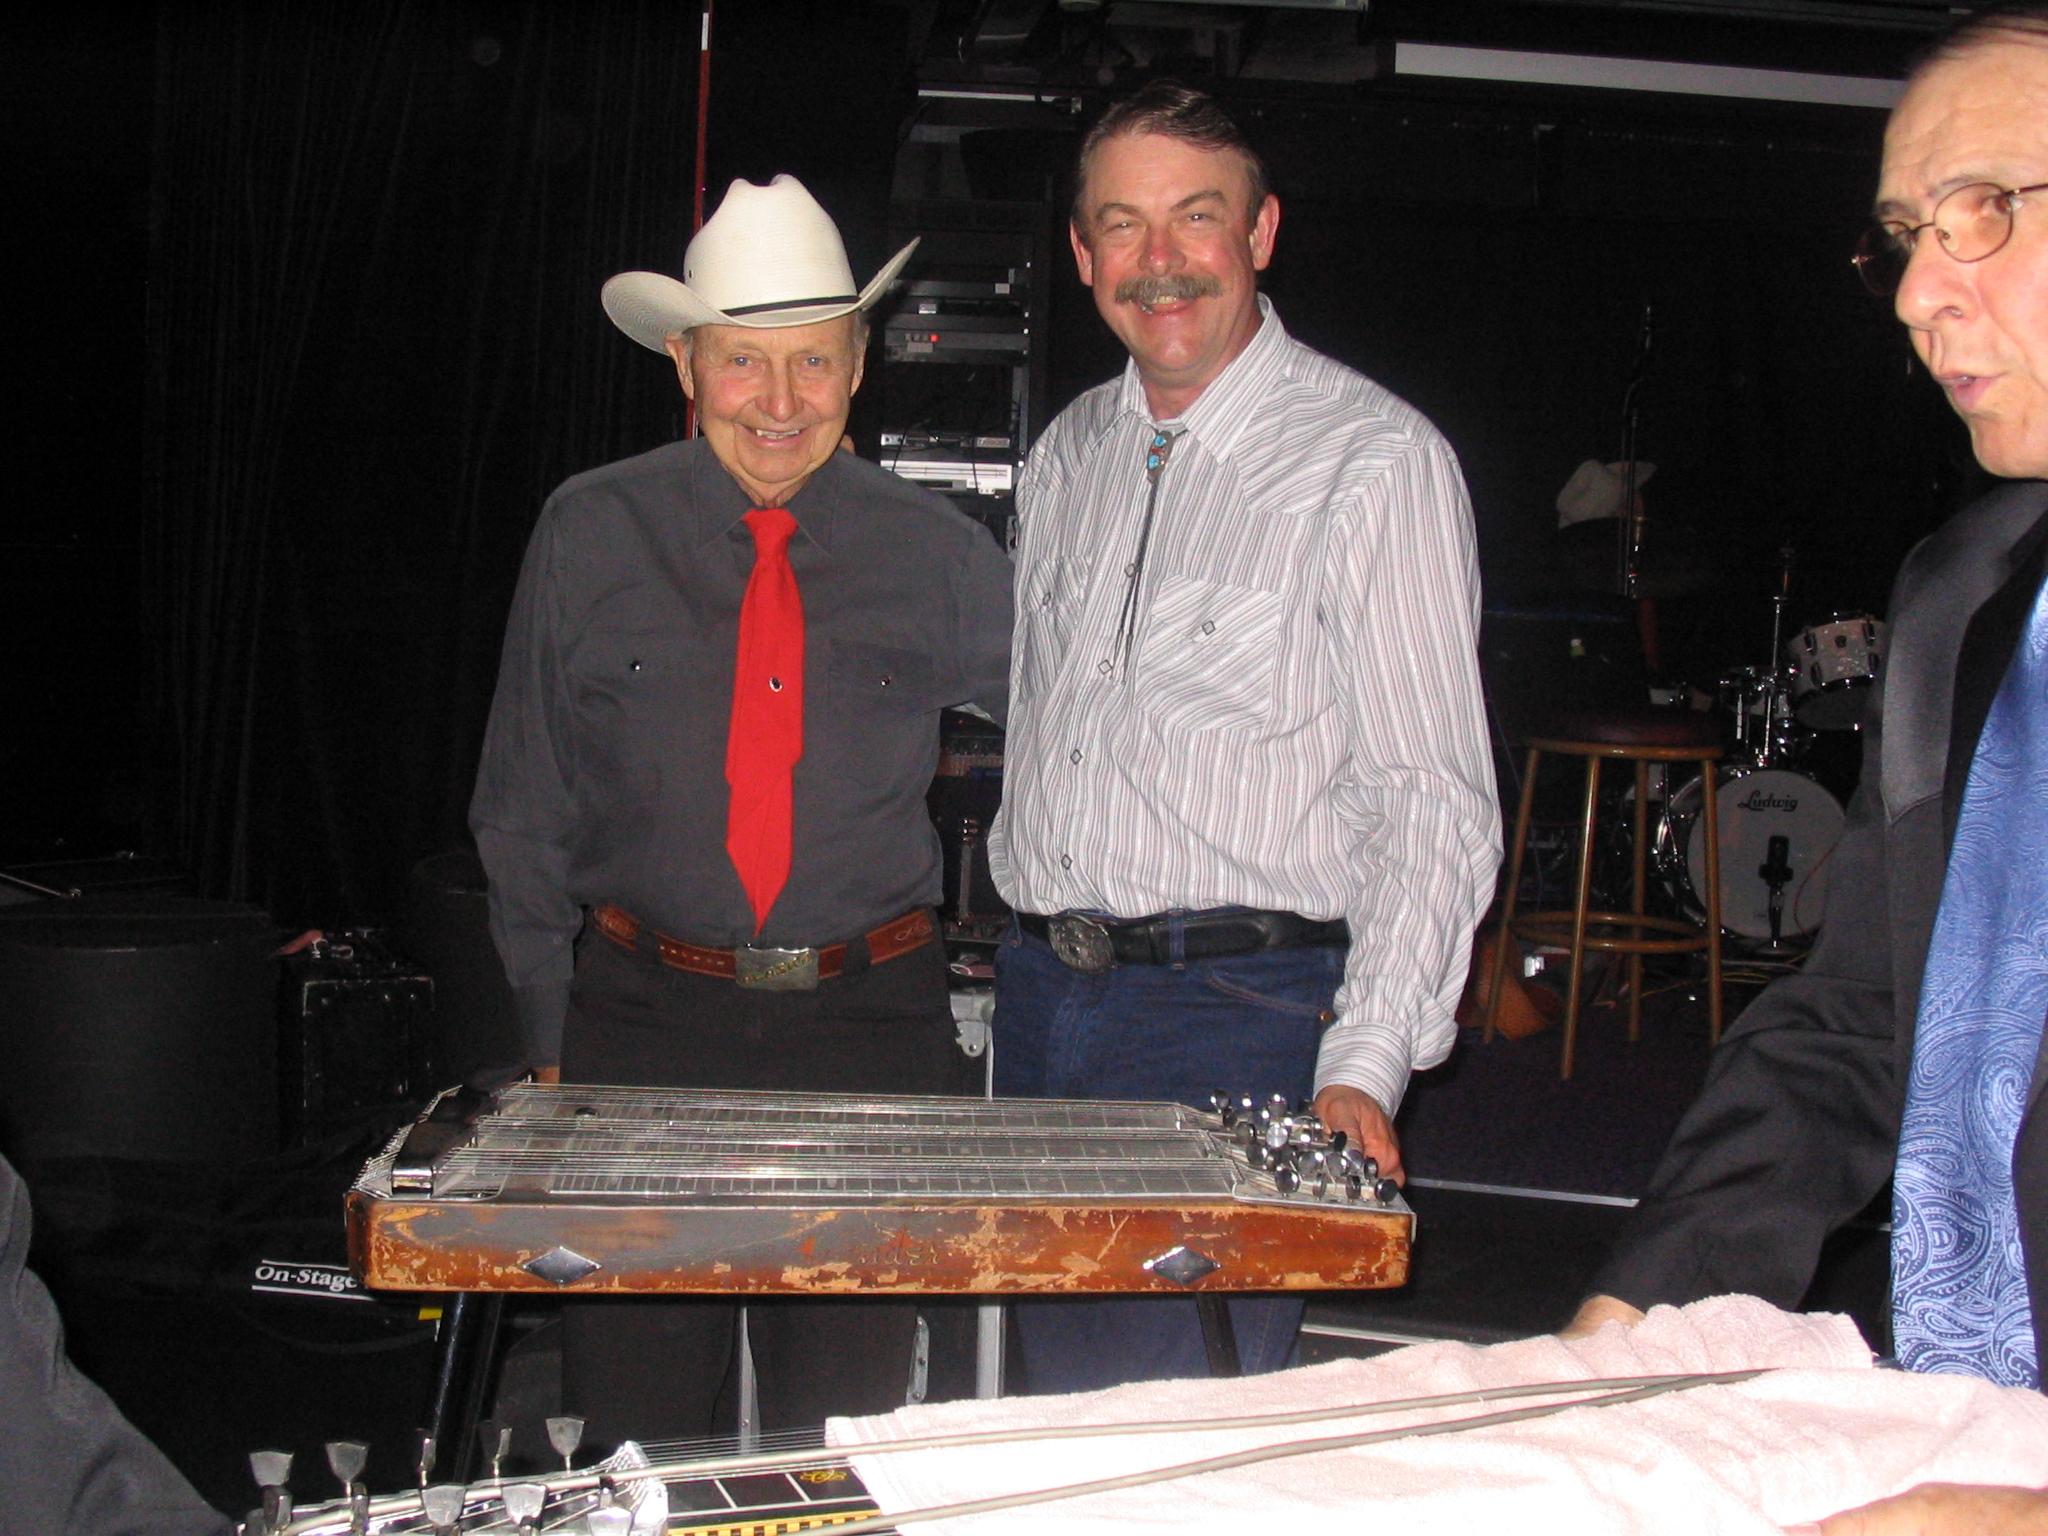 Texas Playboy Bobby Koefer